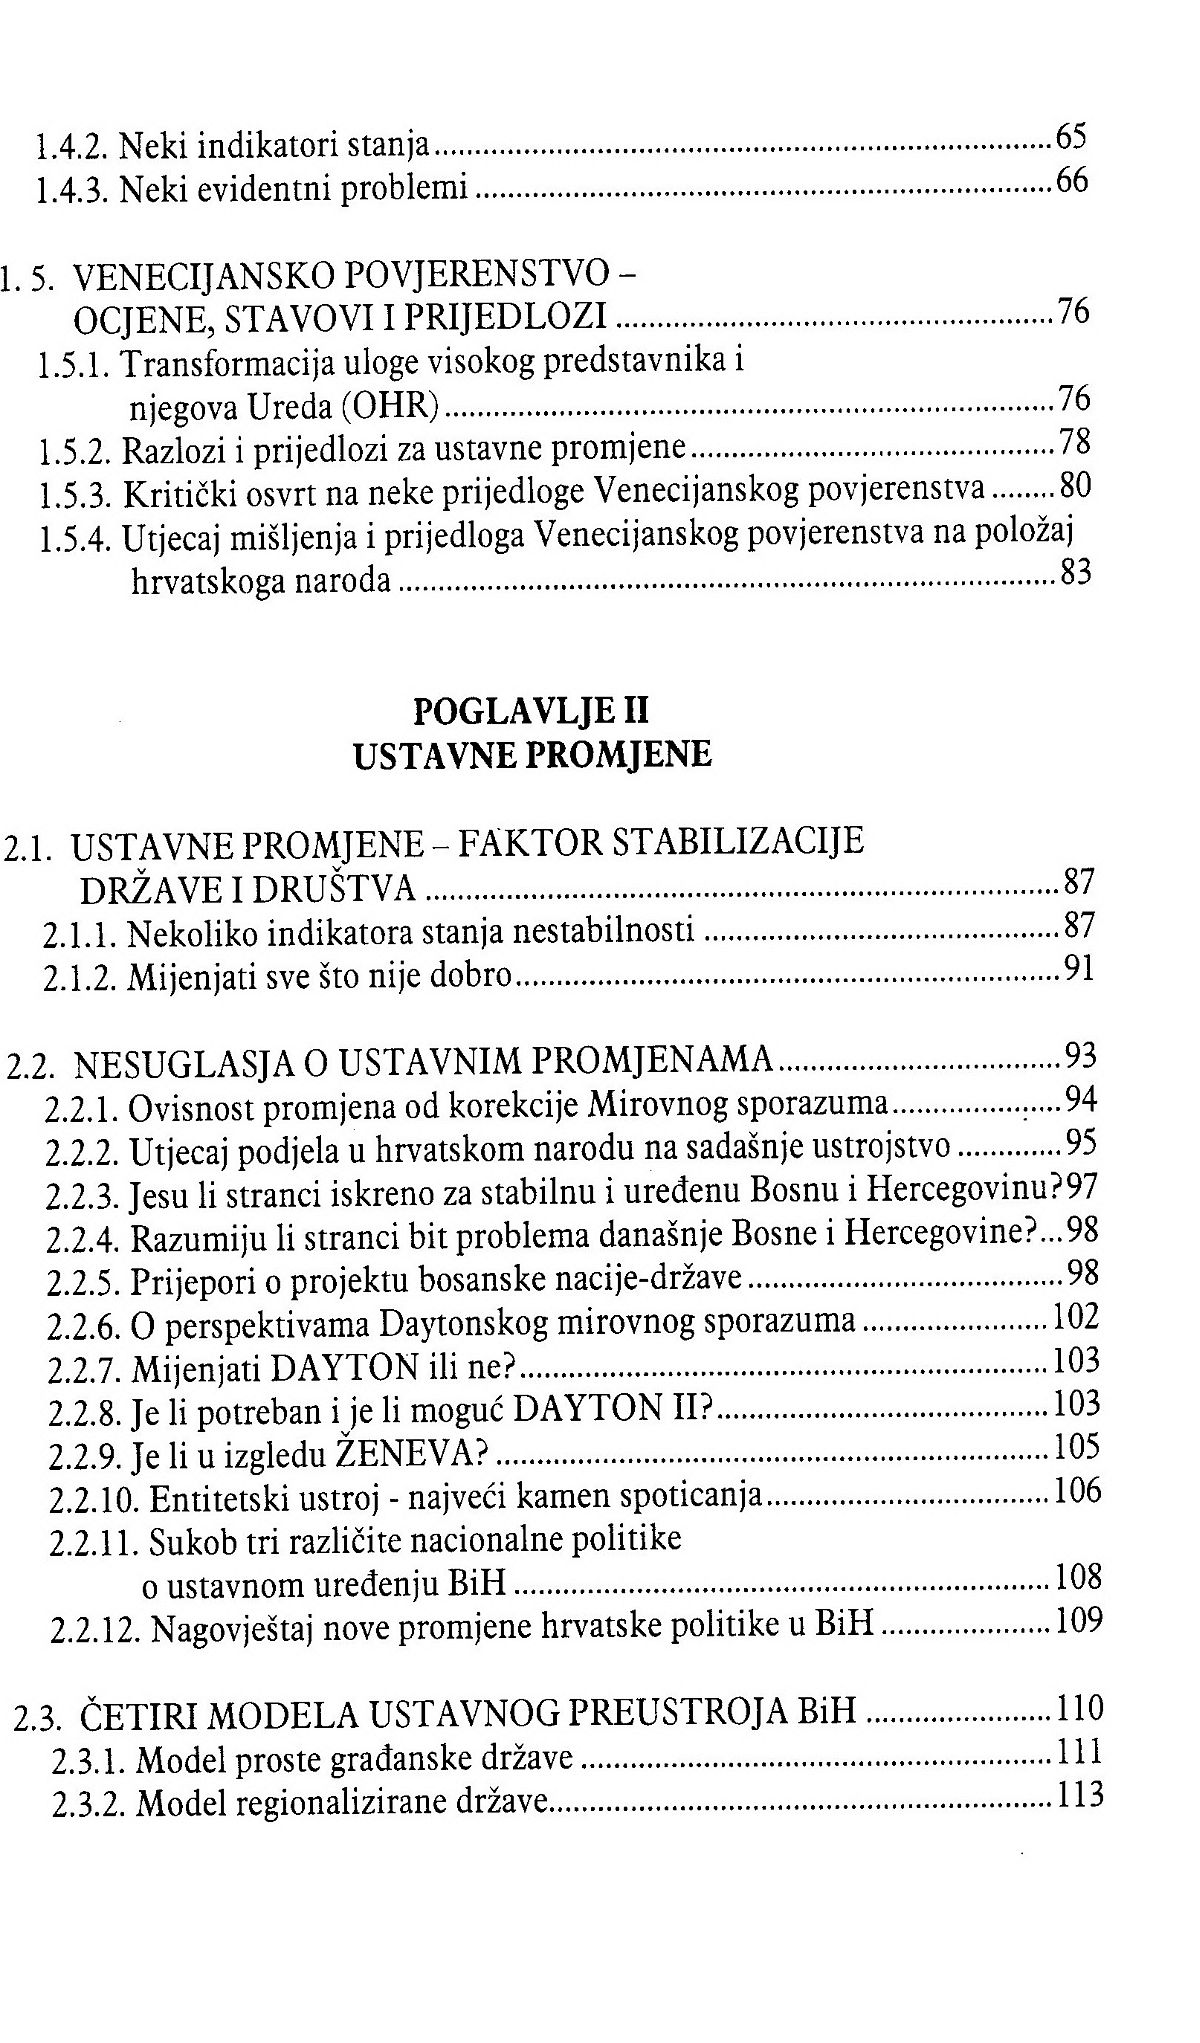 img172